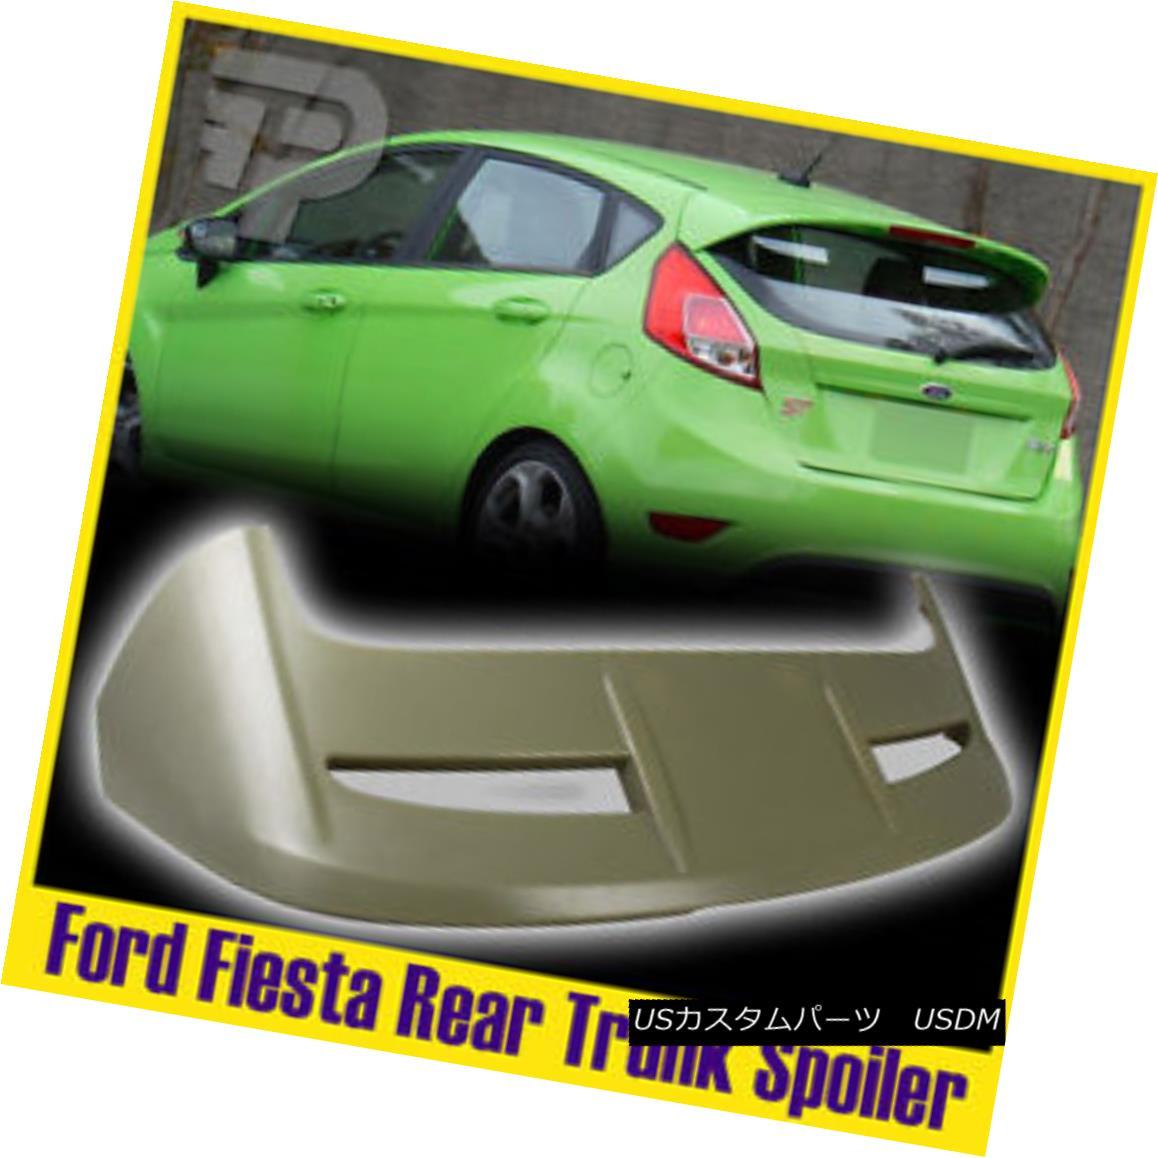 Painted For エアロパーツ Wing Spoiler フォードフィエスタSE 6rd Fiesta Ford Hatchback Boot 2016 Roof SE Rear 6rdハッチバックのために塗装された後部屋根のブートスポイラーウイング2016